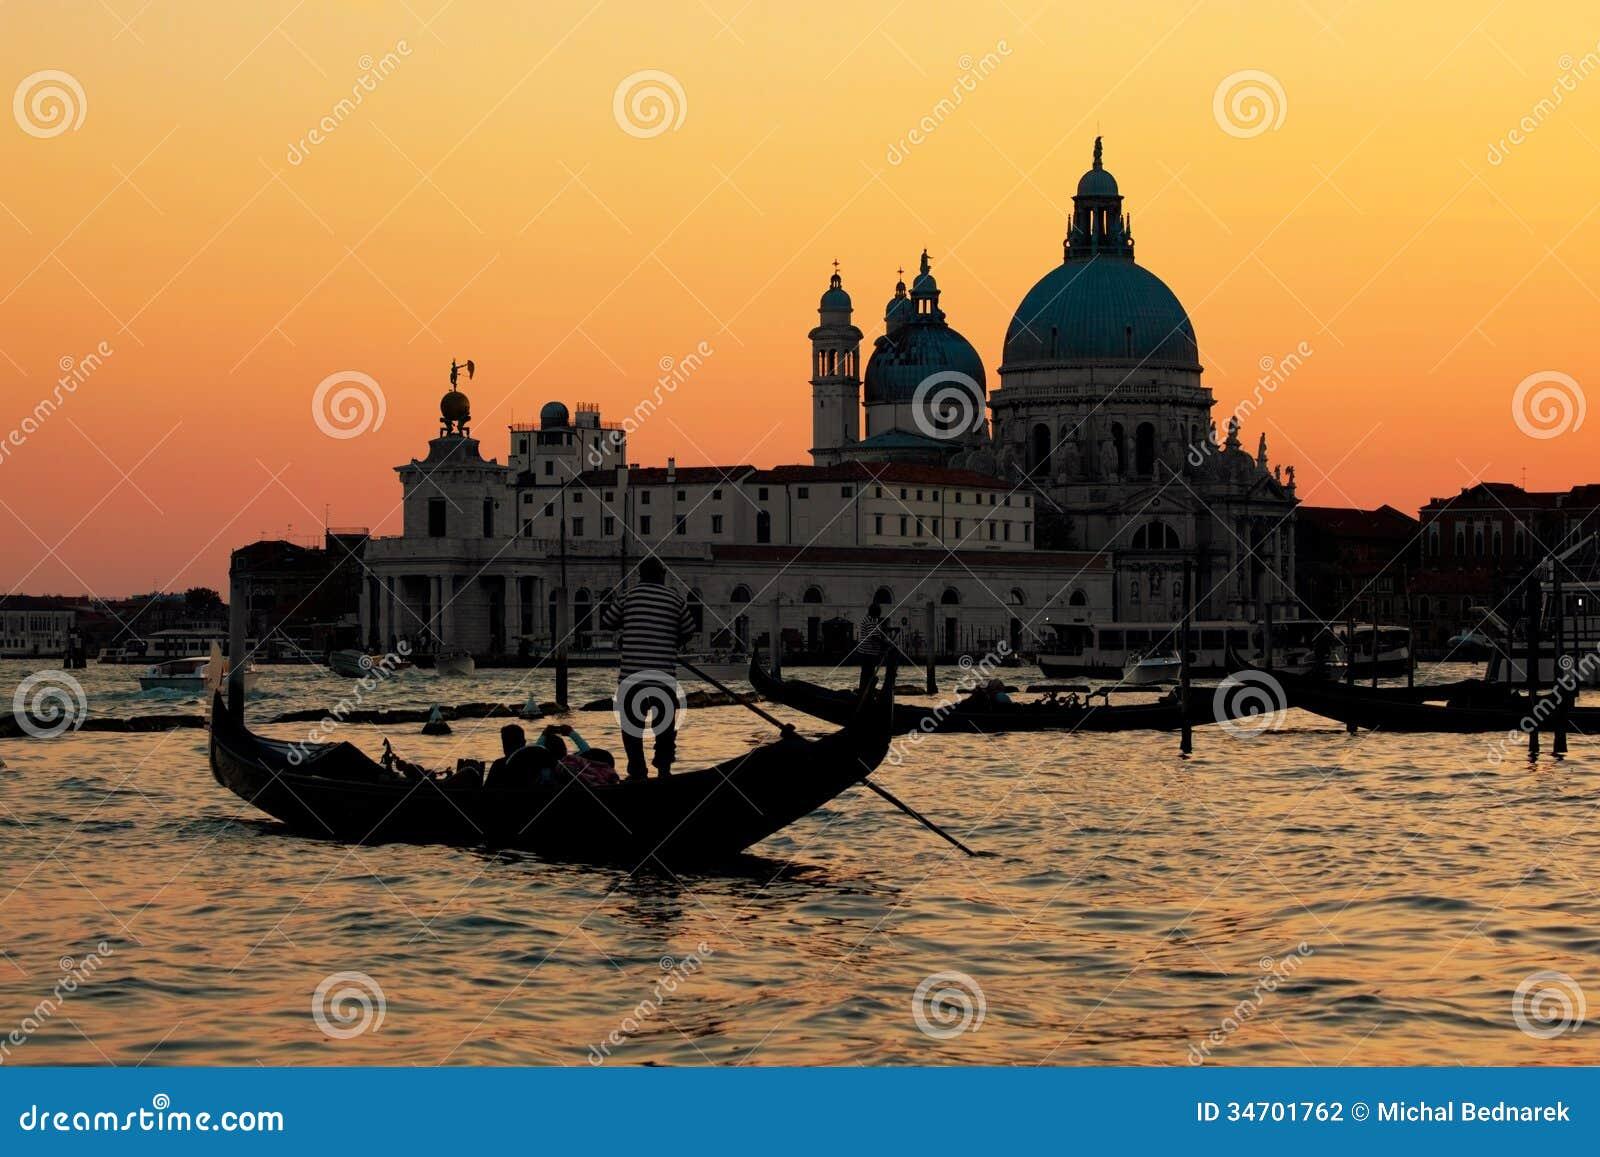 Venedig, Italien. Gondel auf Grand Canal bei Sonnenuntergang